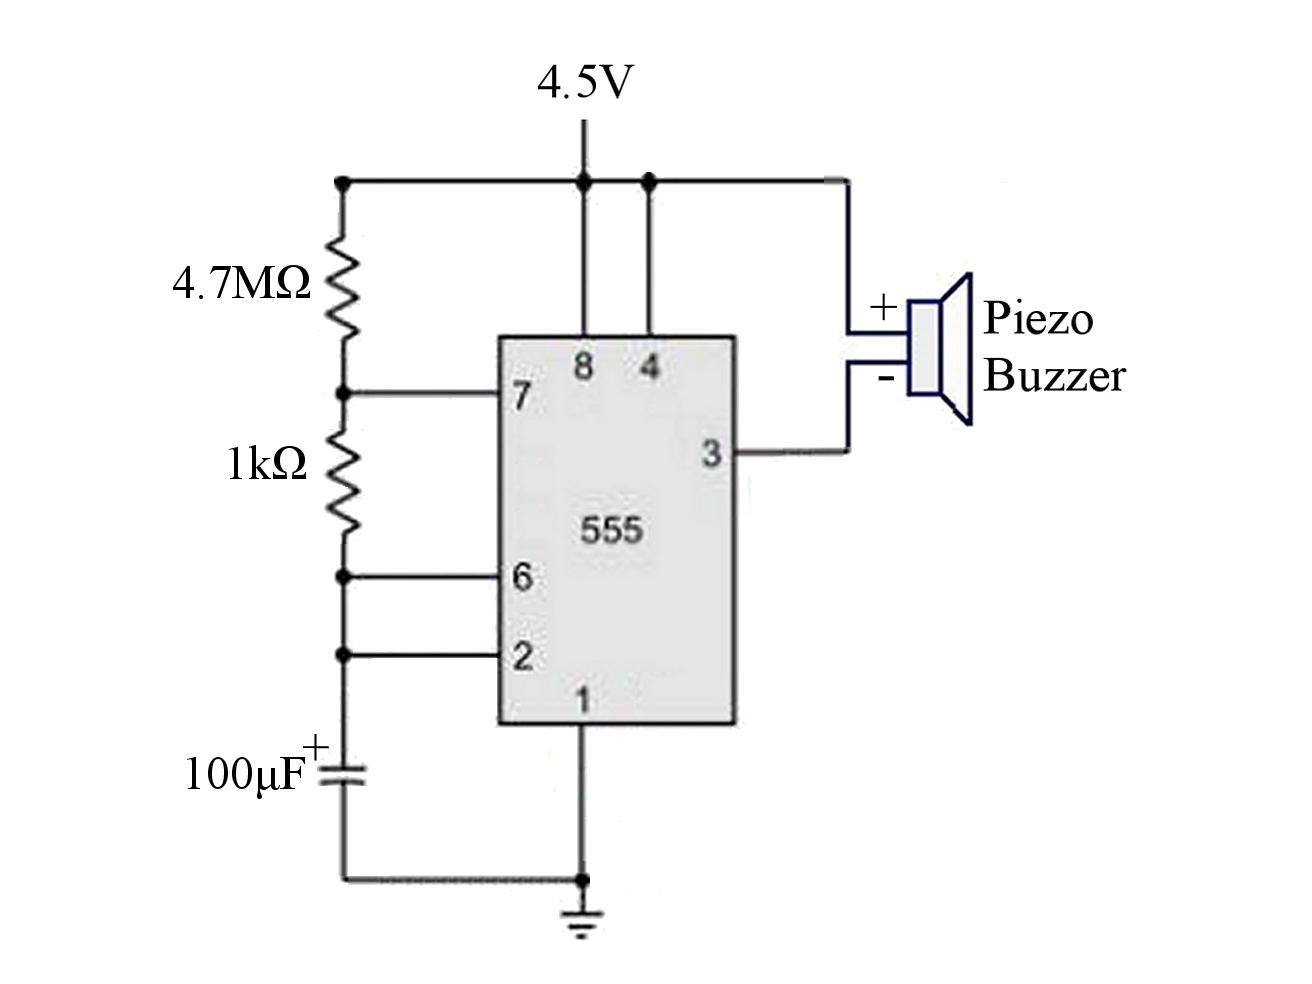 Xh4bY6fTuEVbUGsT?resize=620%2C465 $1 99 piezo buzzer 5vac (breadboard compatible) tinkersphere